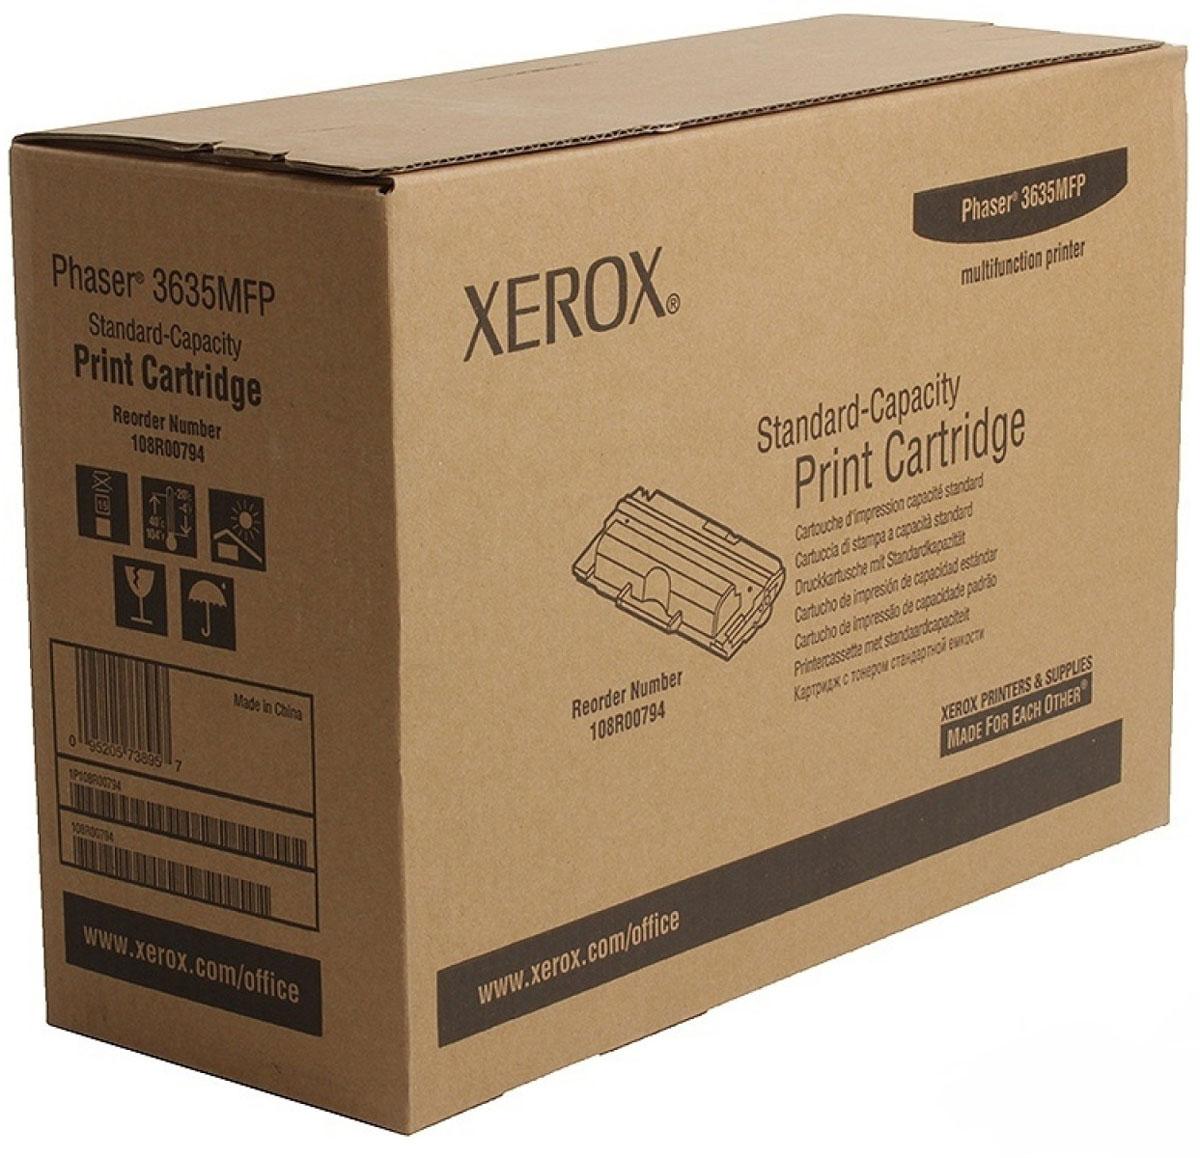 Xerox 108R00794, Black тонер-картридж для Xerox Phaser 3635MFP картридж xerox 113r00663